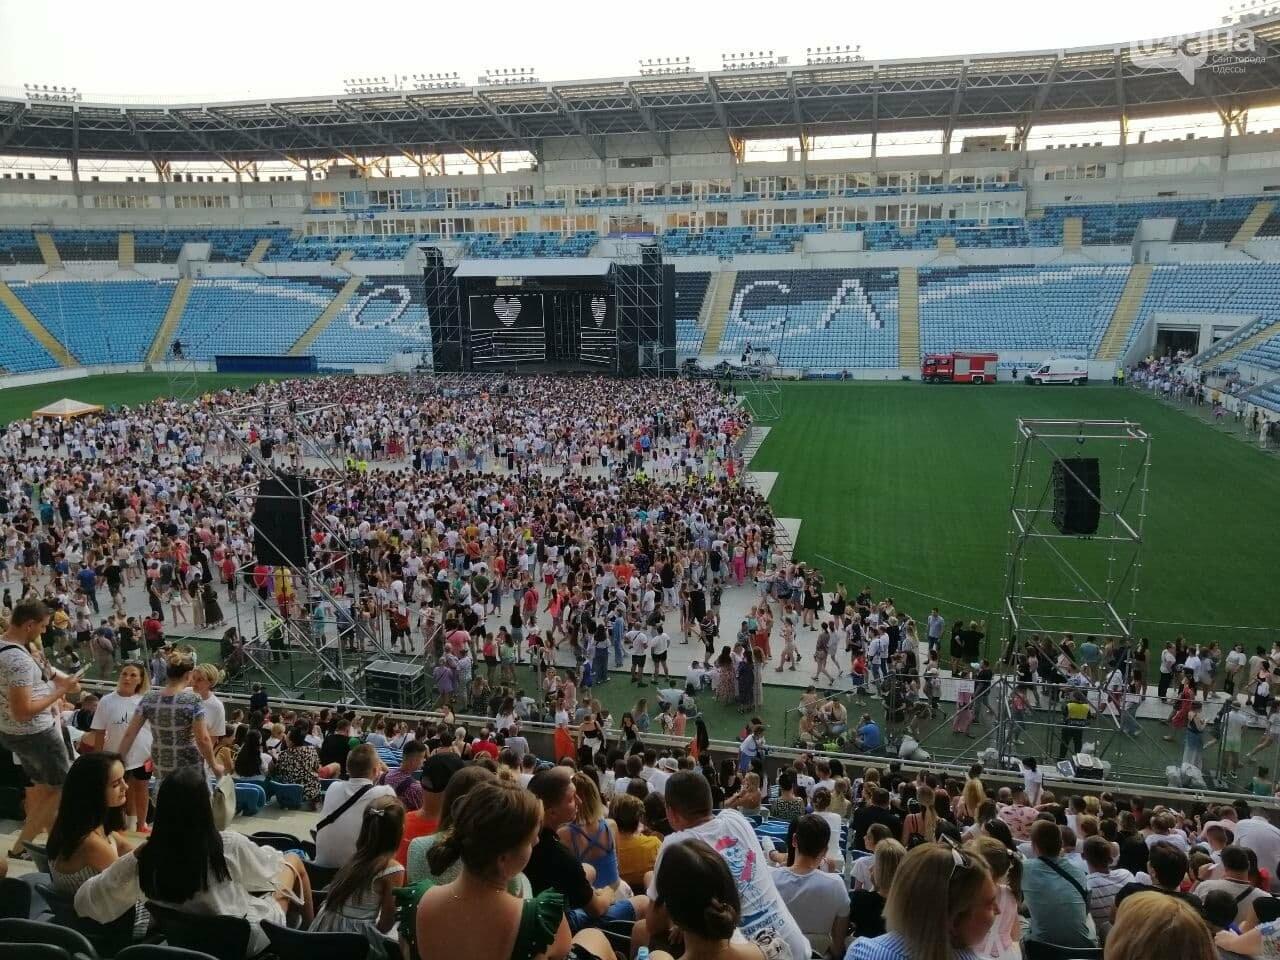 Монатик на стадионе спел все песни об Одессе, - ФОТО, ВИДЕО, фото-7